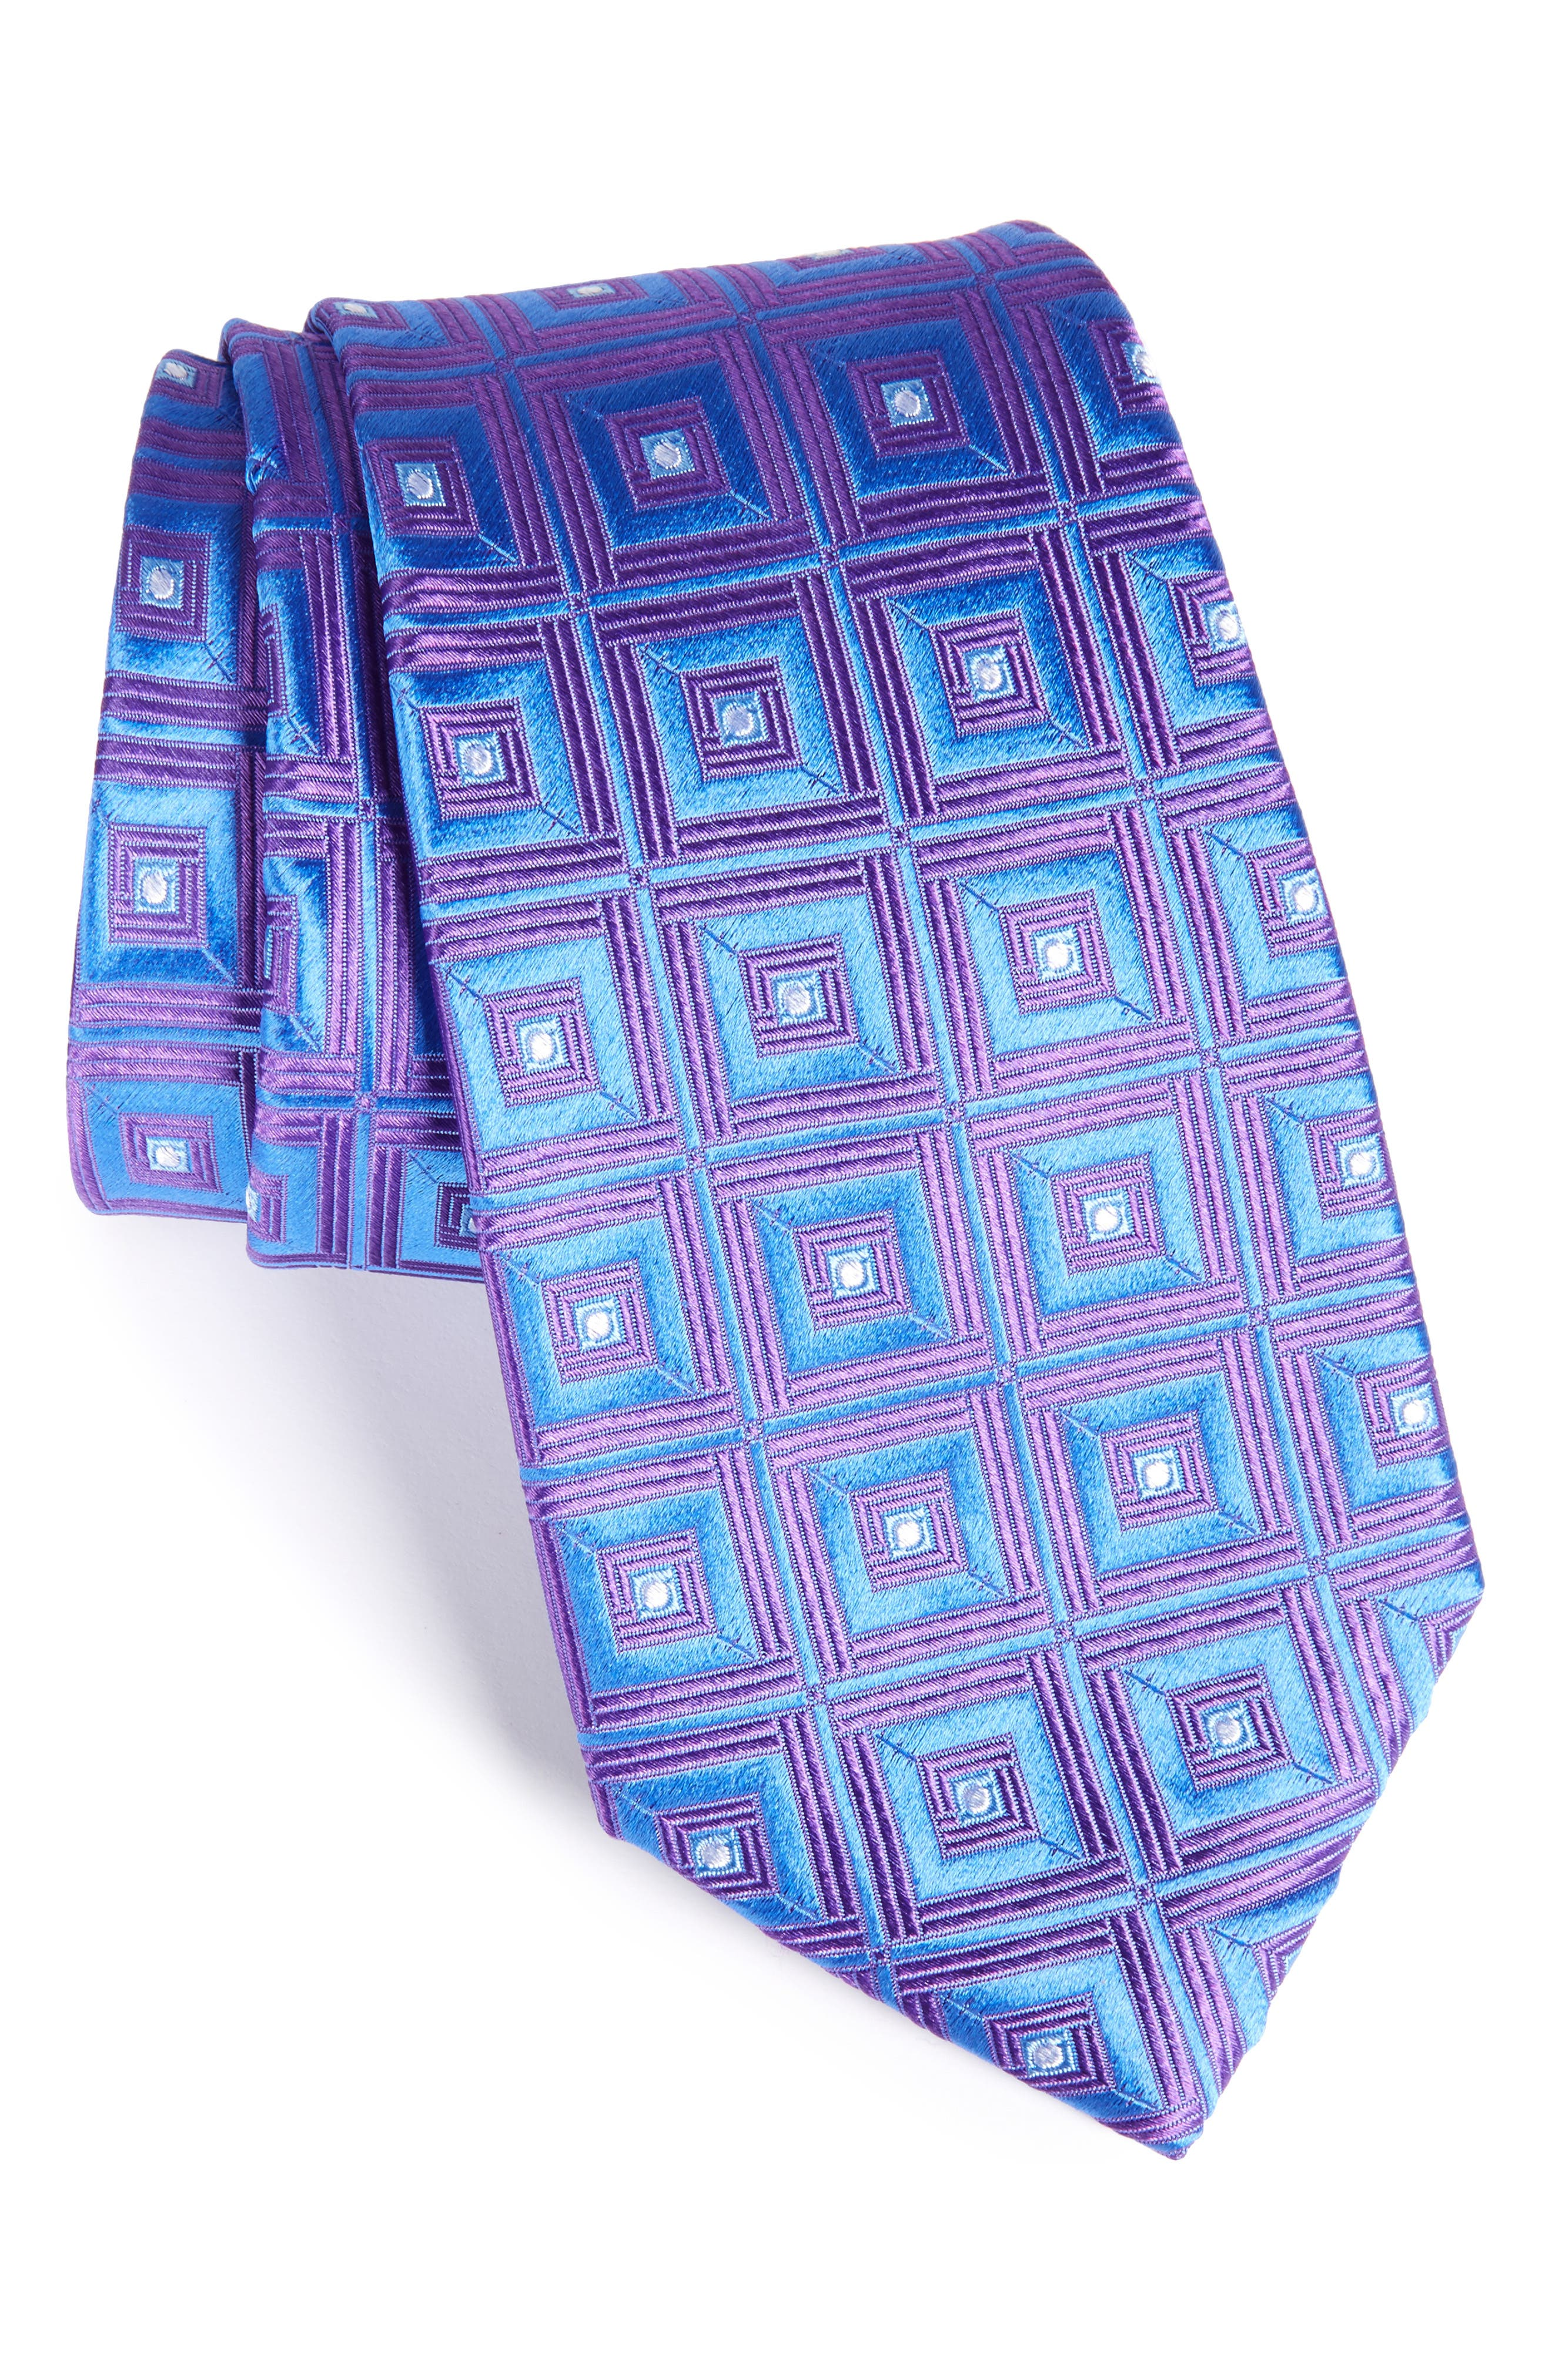 Alternate Image 1 Selected - Nordstrom Men's Shop Frame Diamonds Silk Tie